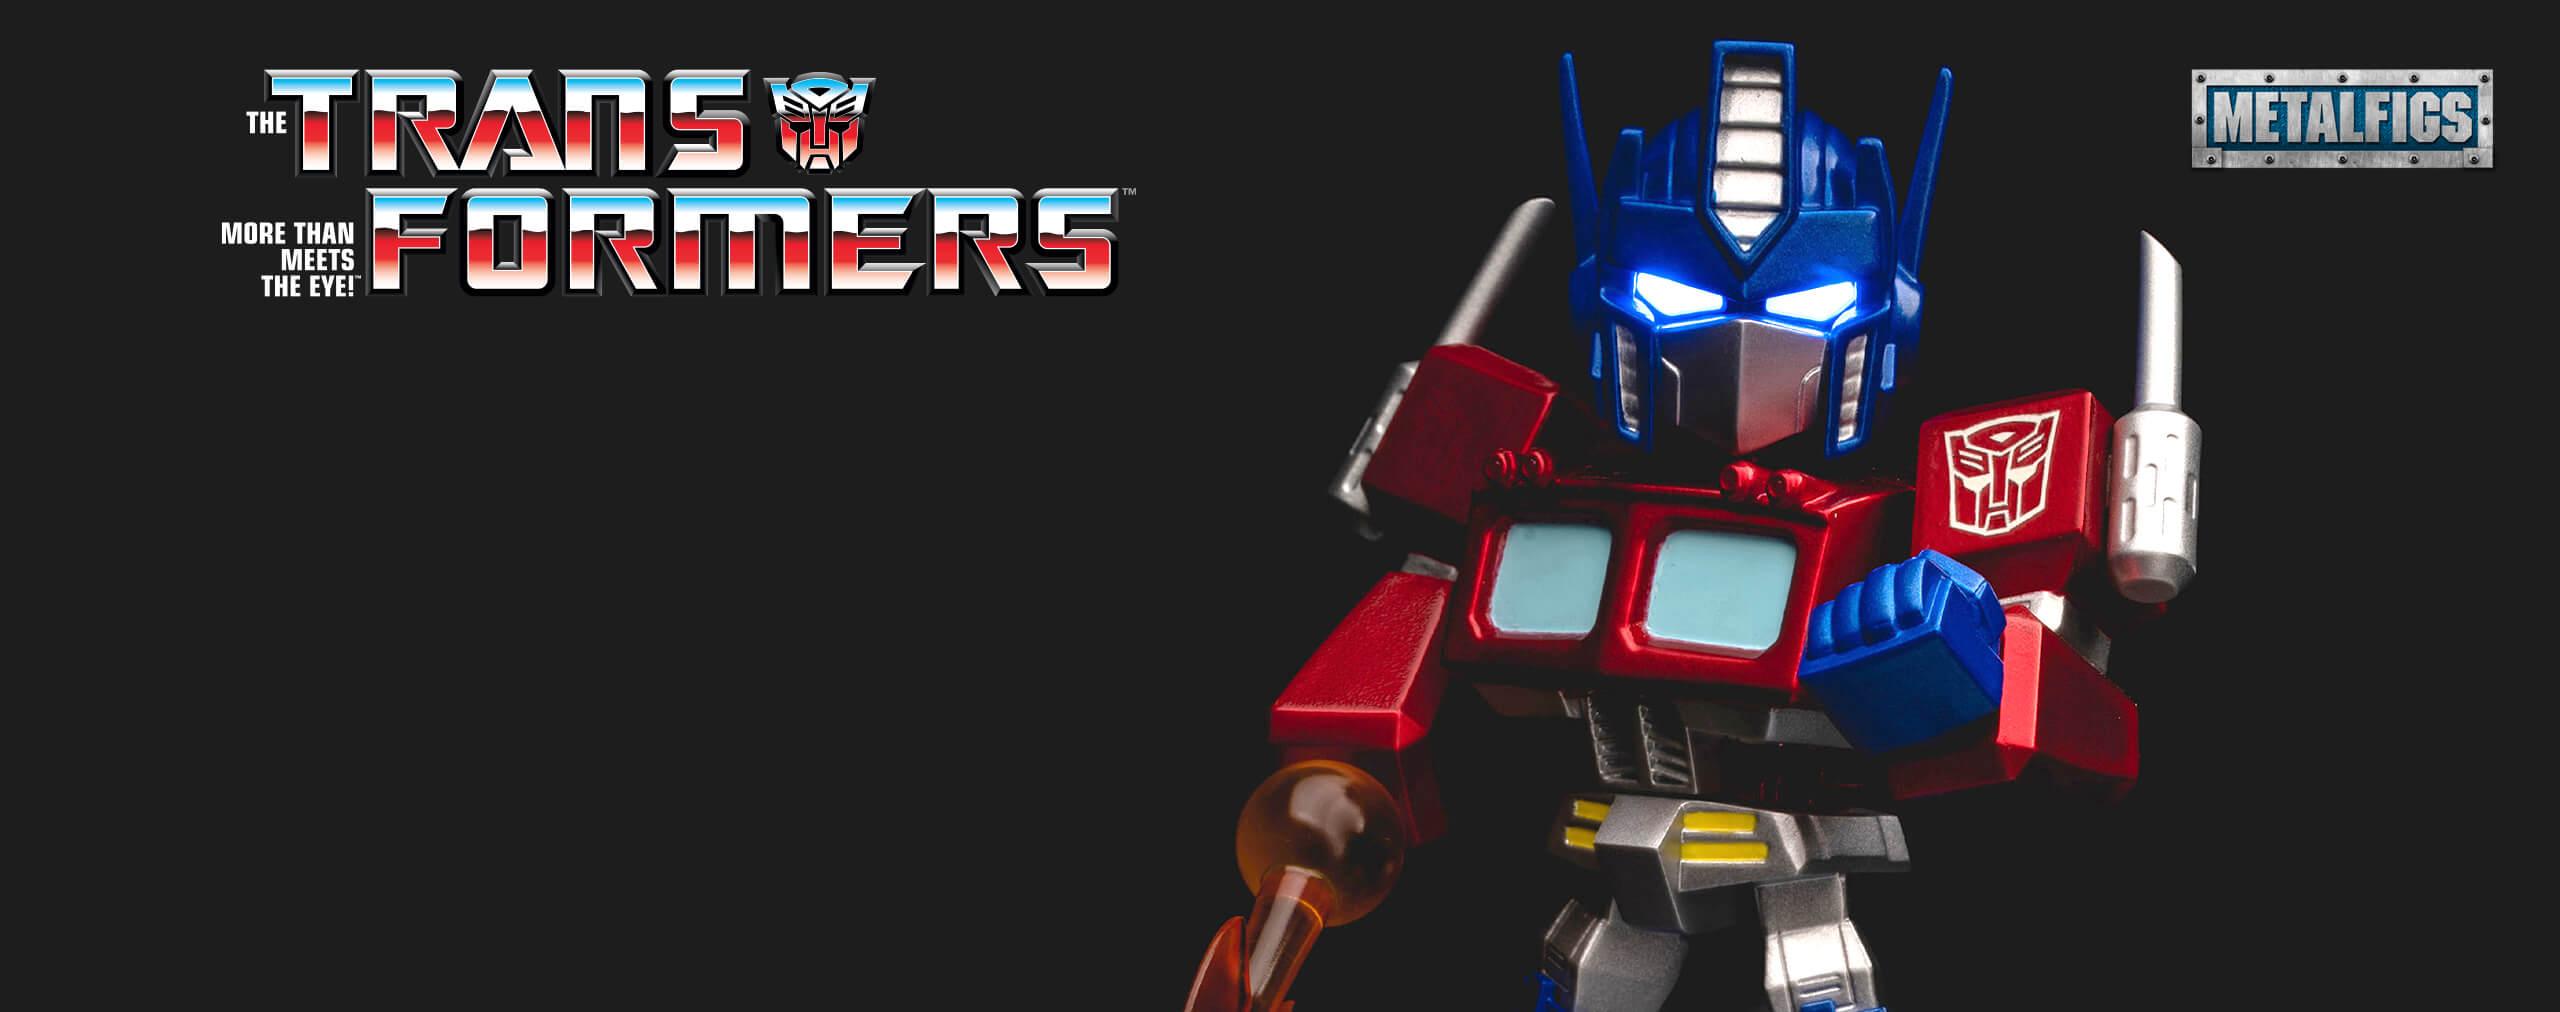 Metalfigs Transformers - Optimus Prime